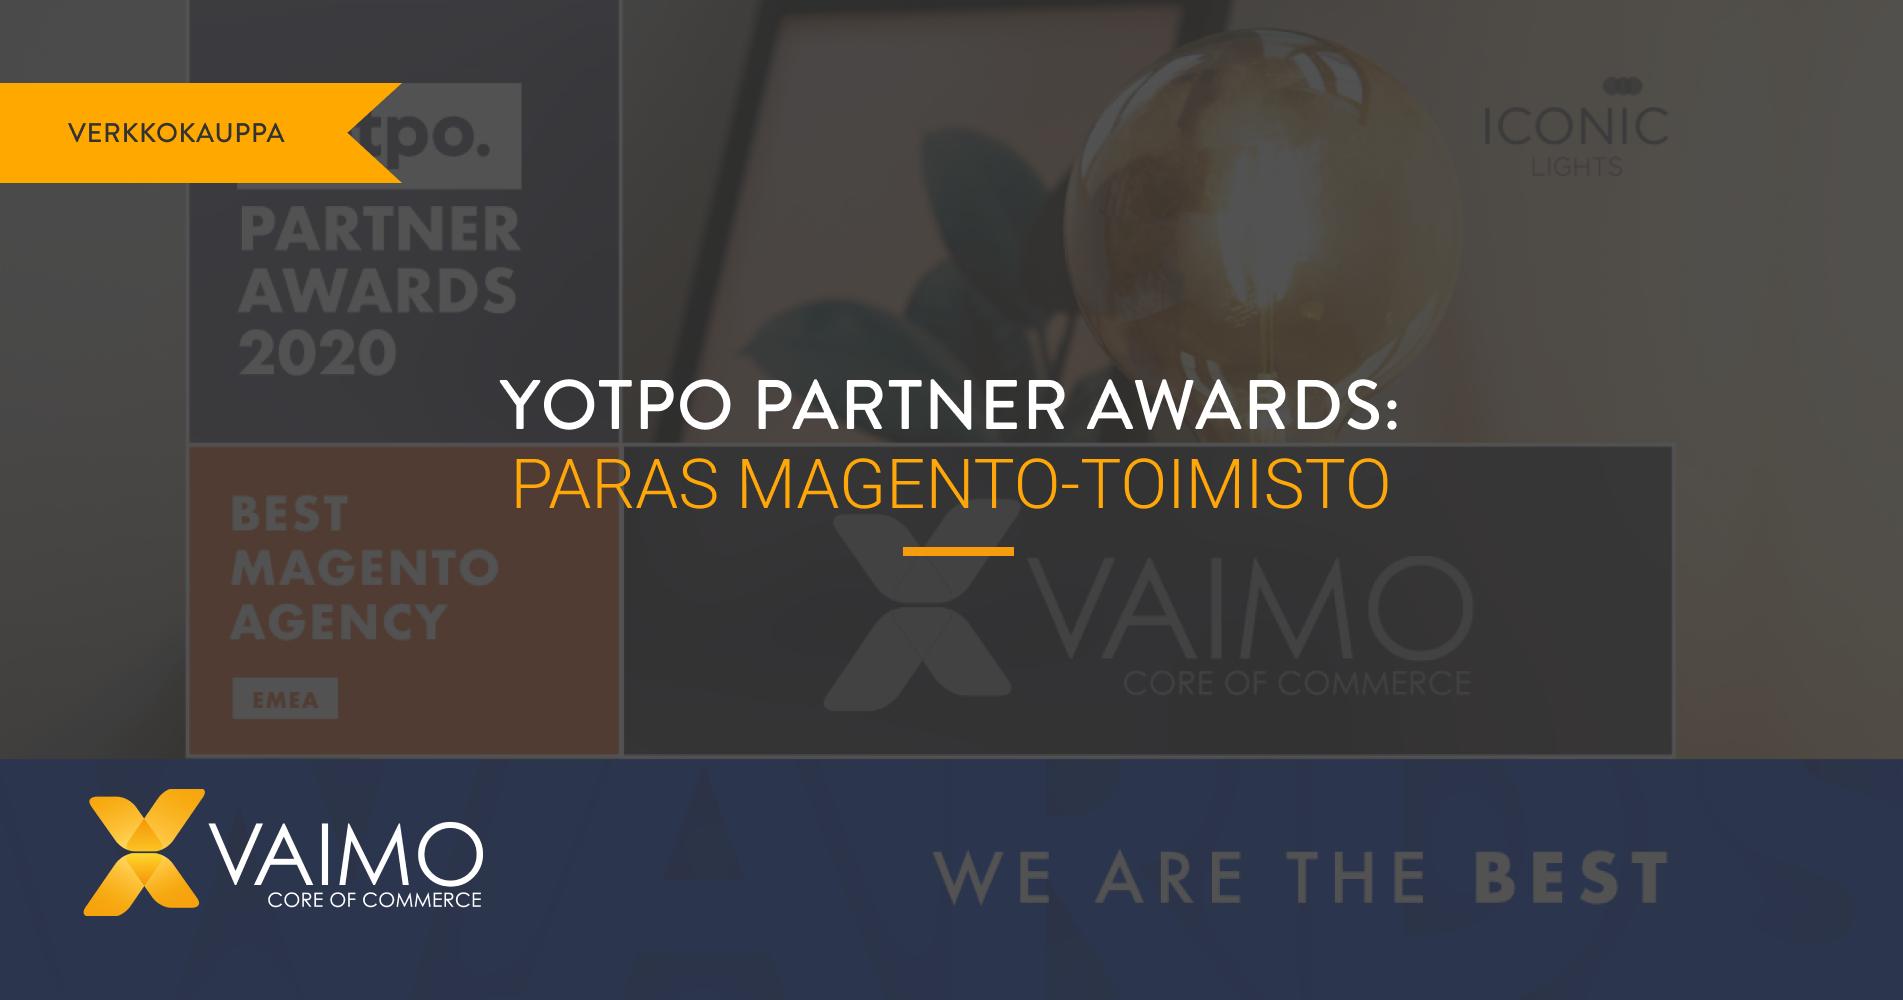 Yotpo Partner Awards